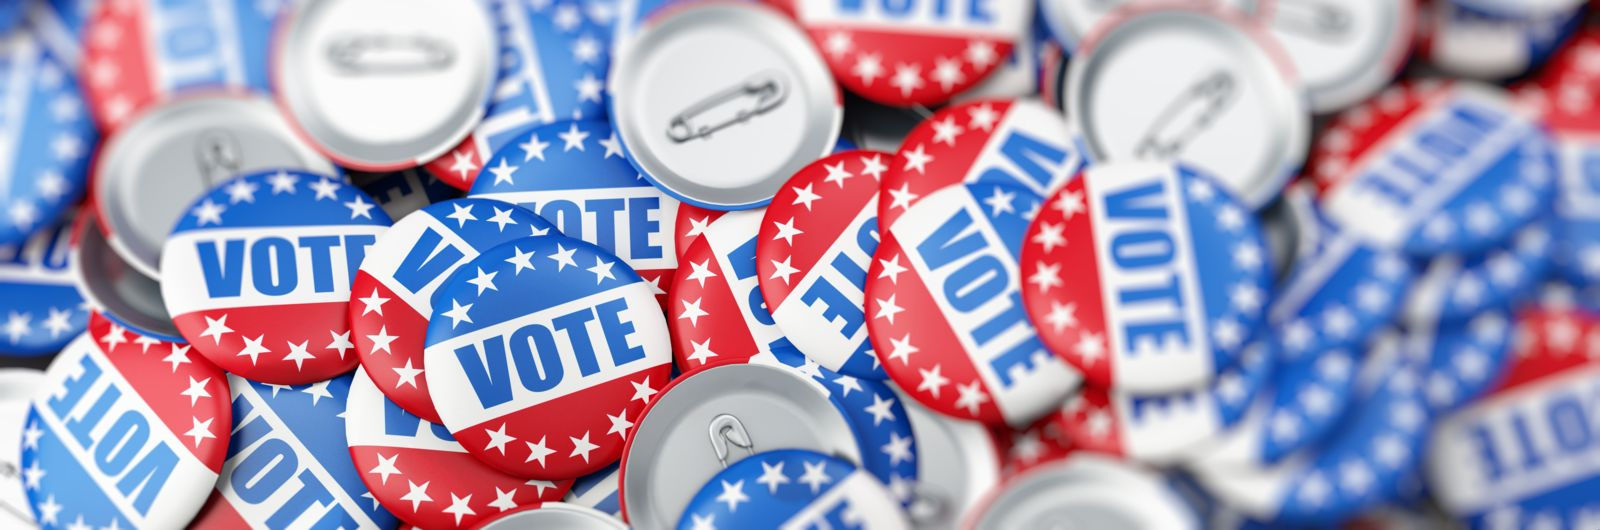 Arizona voting rights